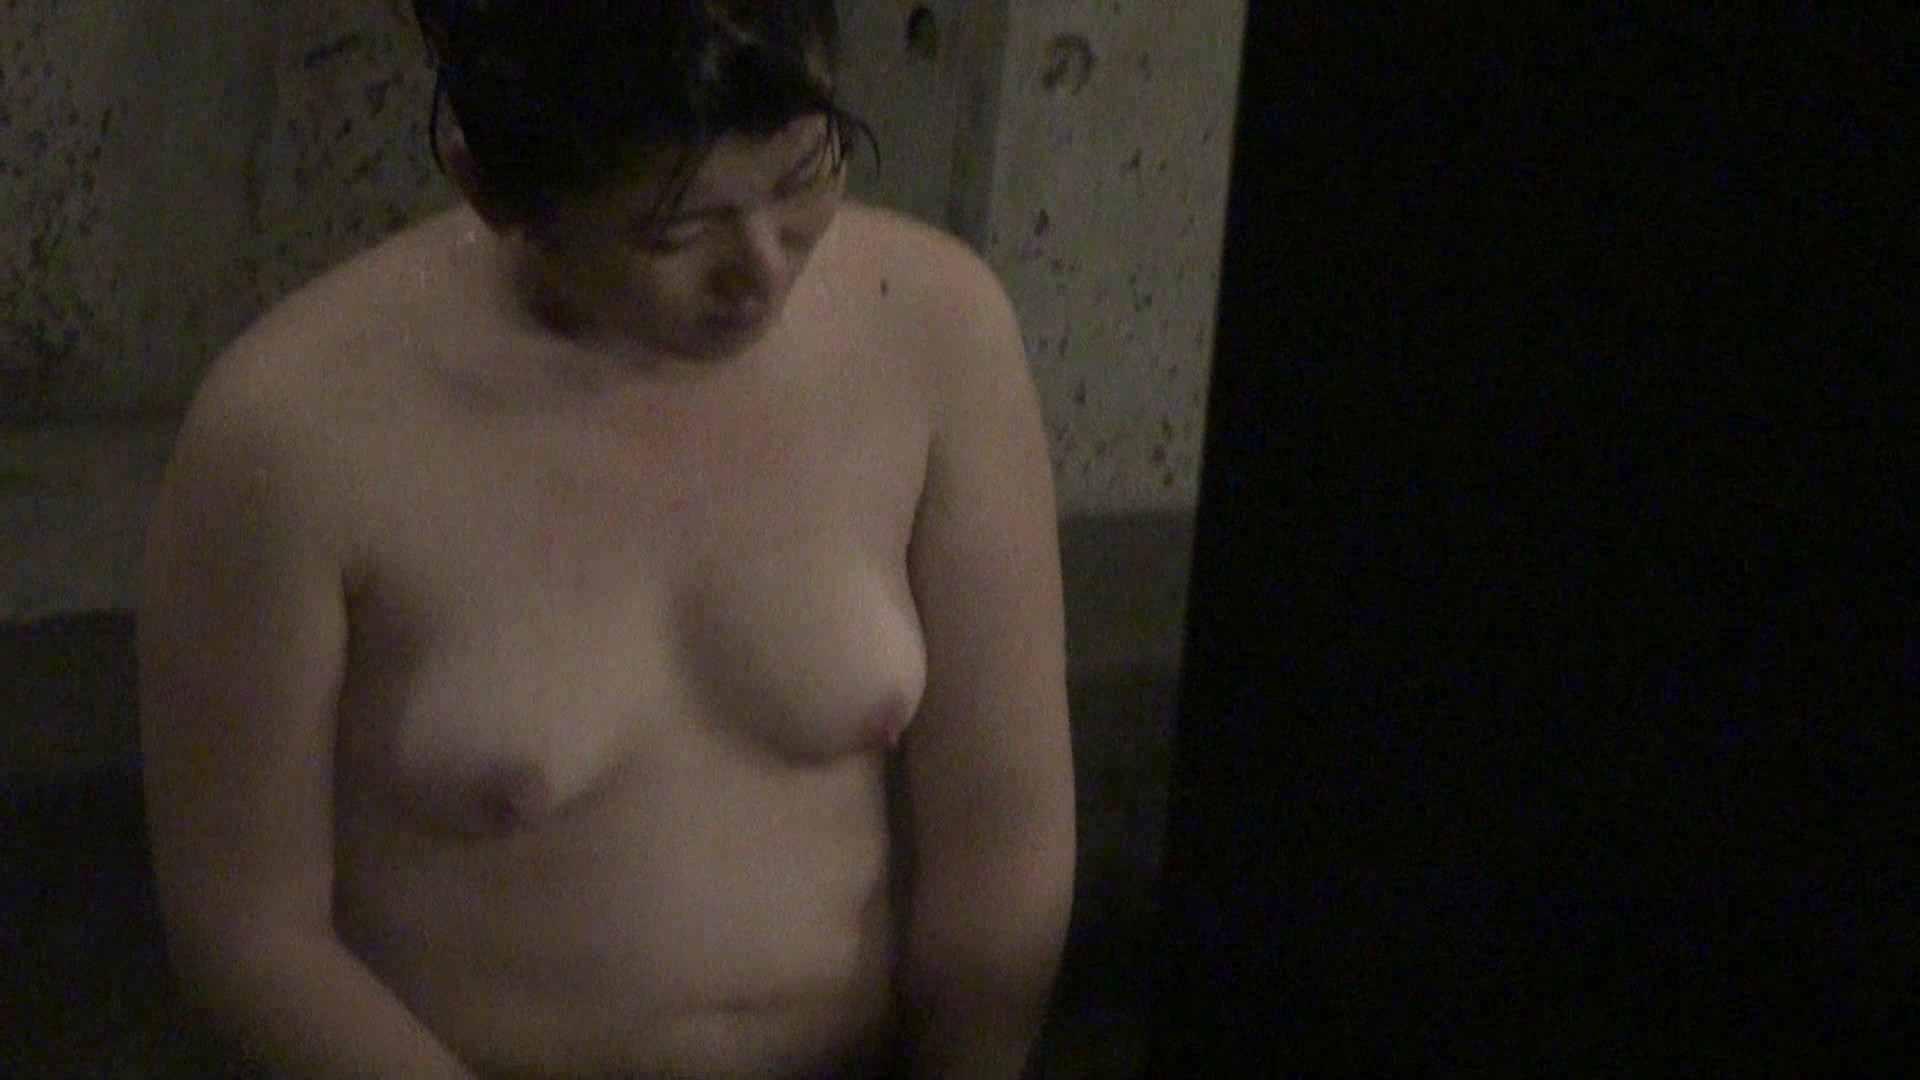 Aquaな露天風呂Vol.334 露天風呂突入 のぞき動画画像 102pic 53